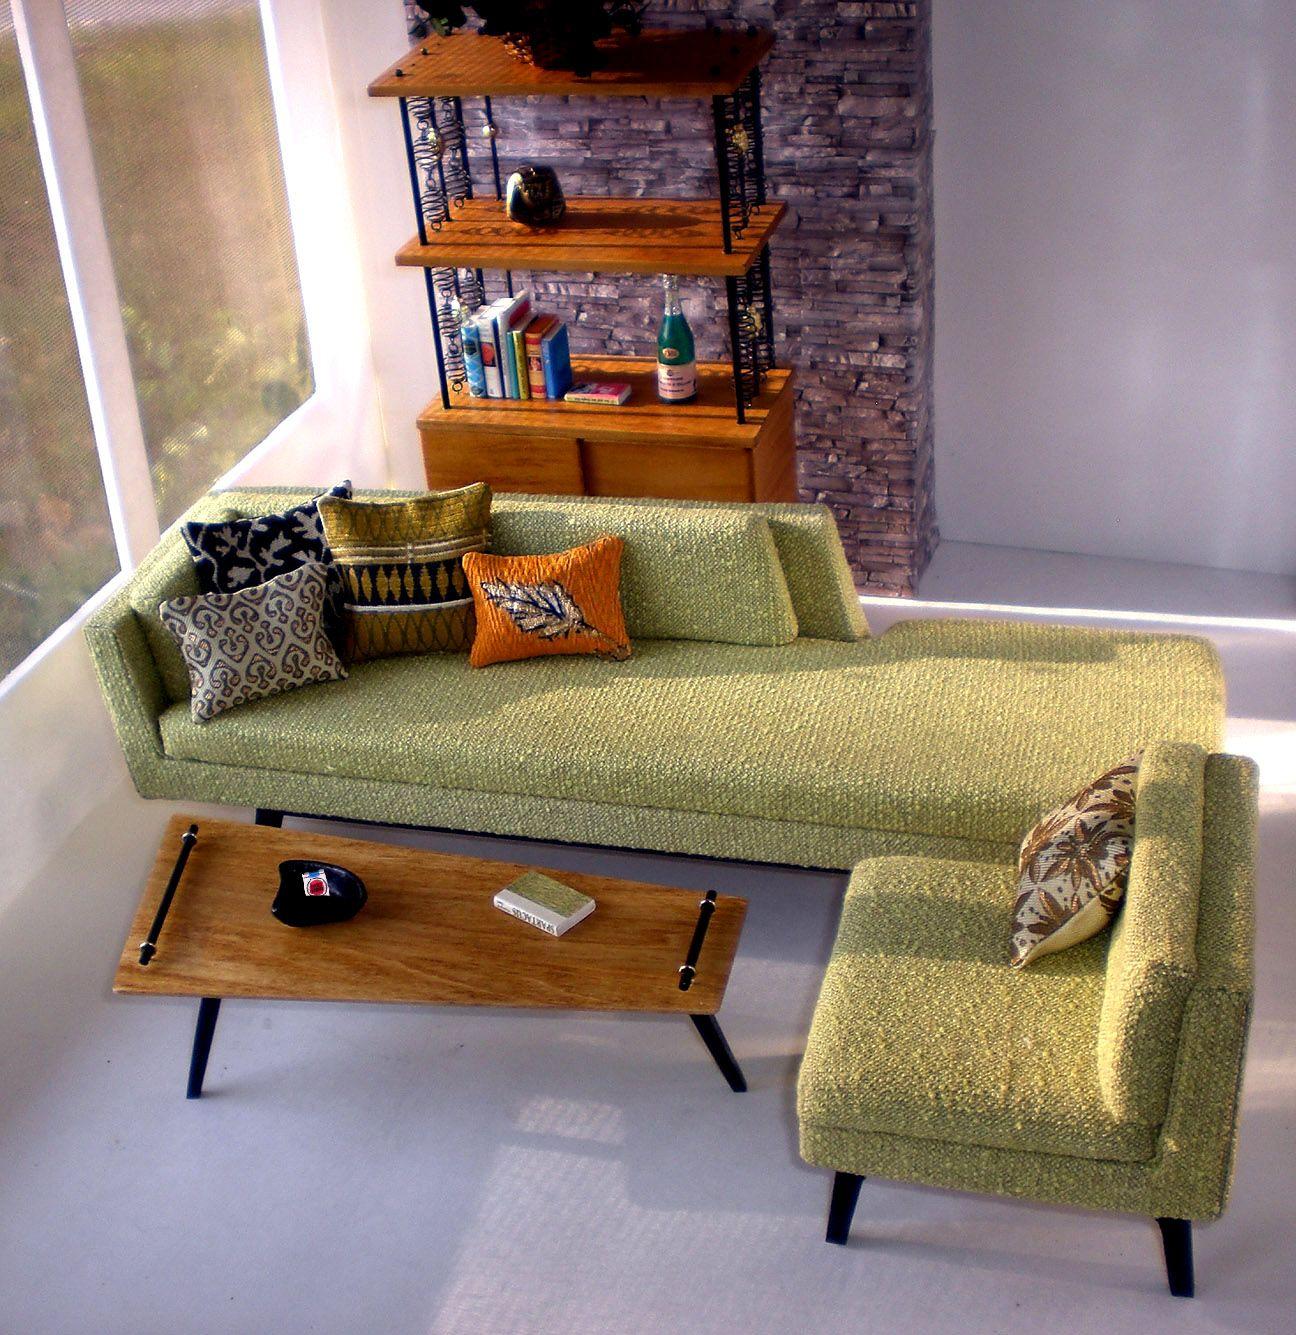 morrison's furniture studio 1:6 scale :) | muebles para